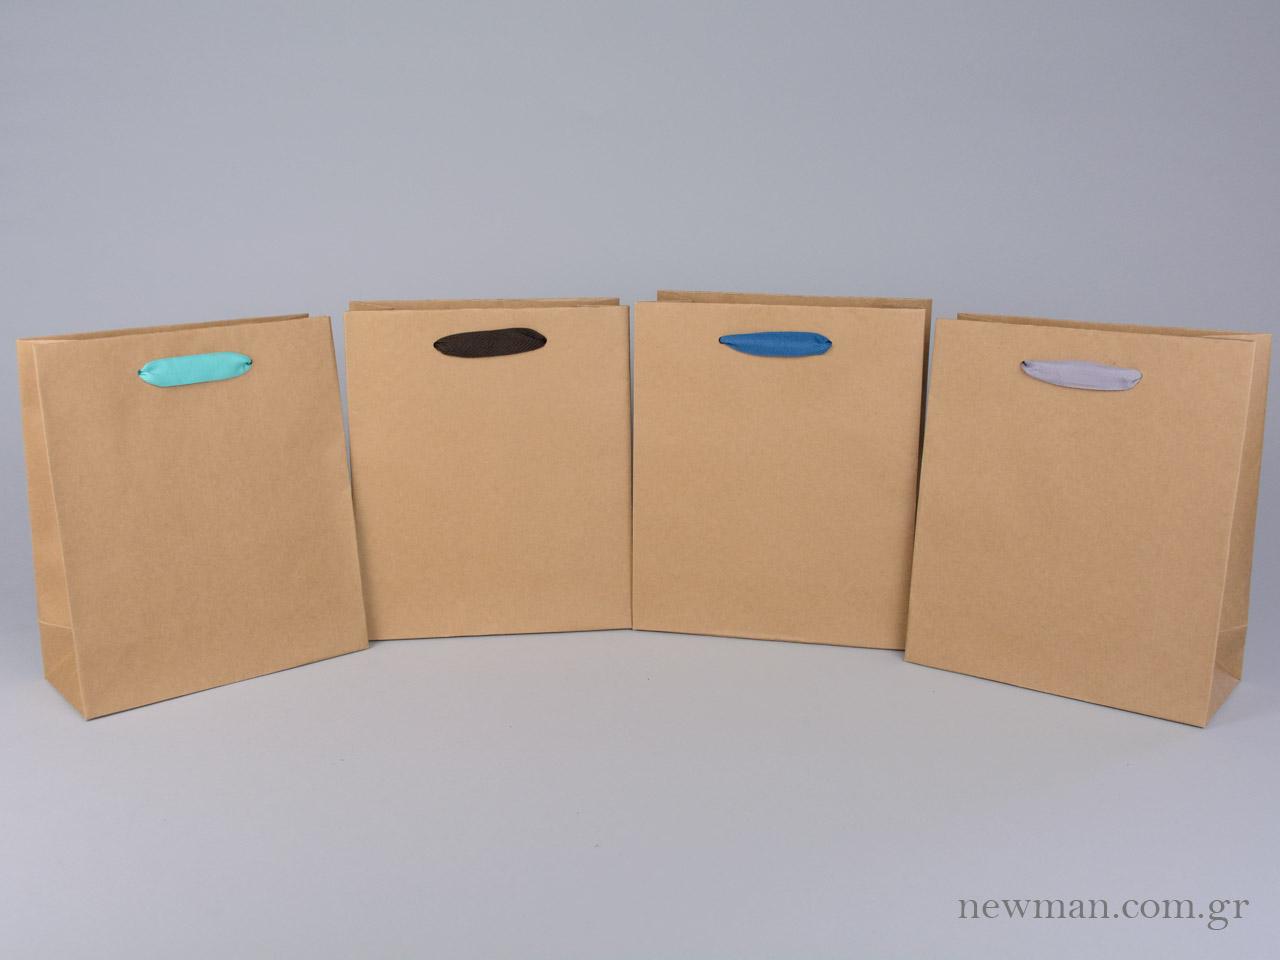 2cb15381c8 Χάρτινες τσάντες kraft σε 8 μεγέθη με λαβές φακαρόλα σε 4 χρώματα ...